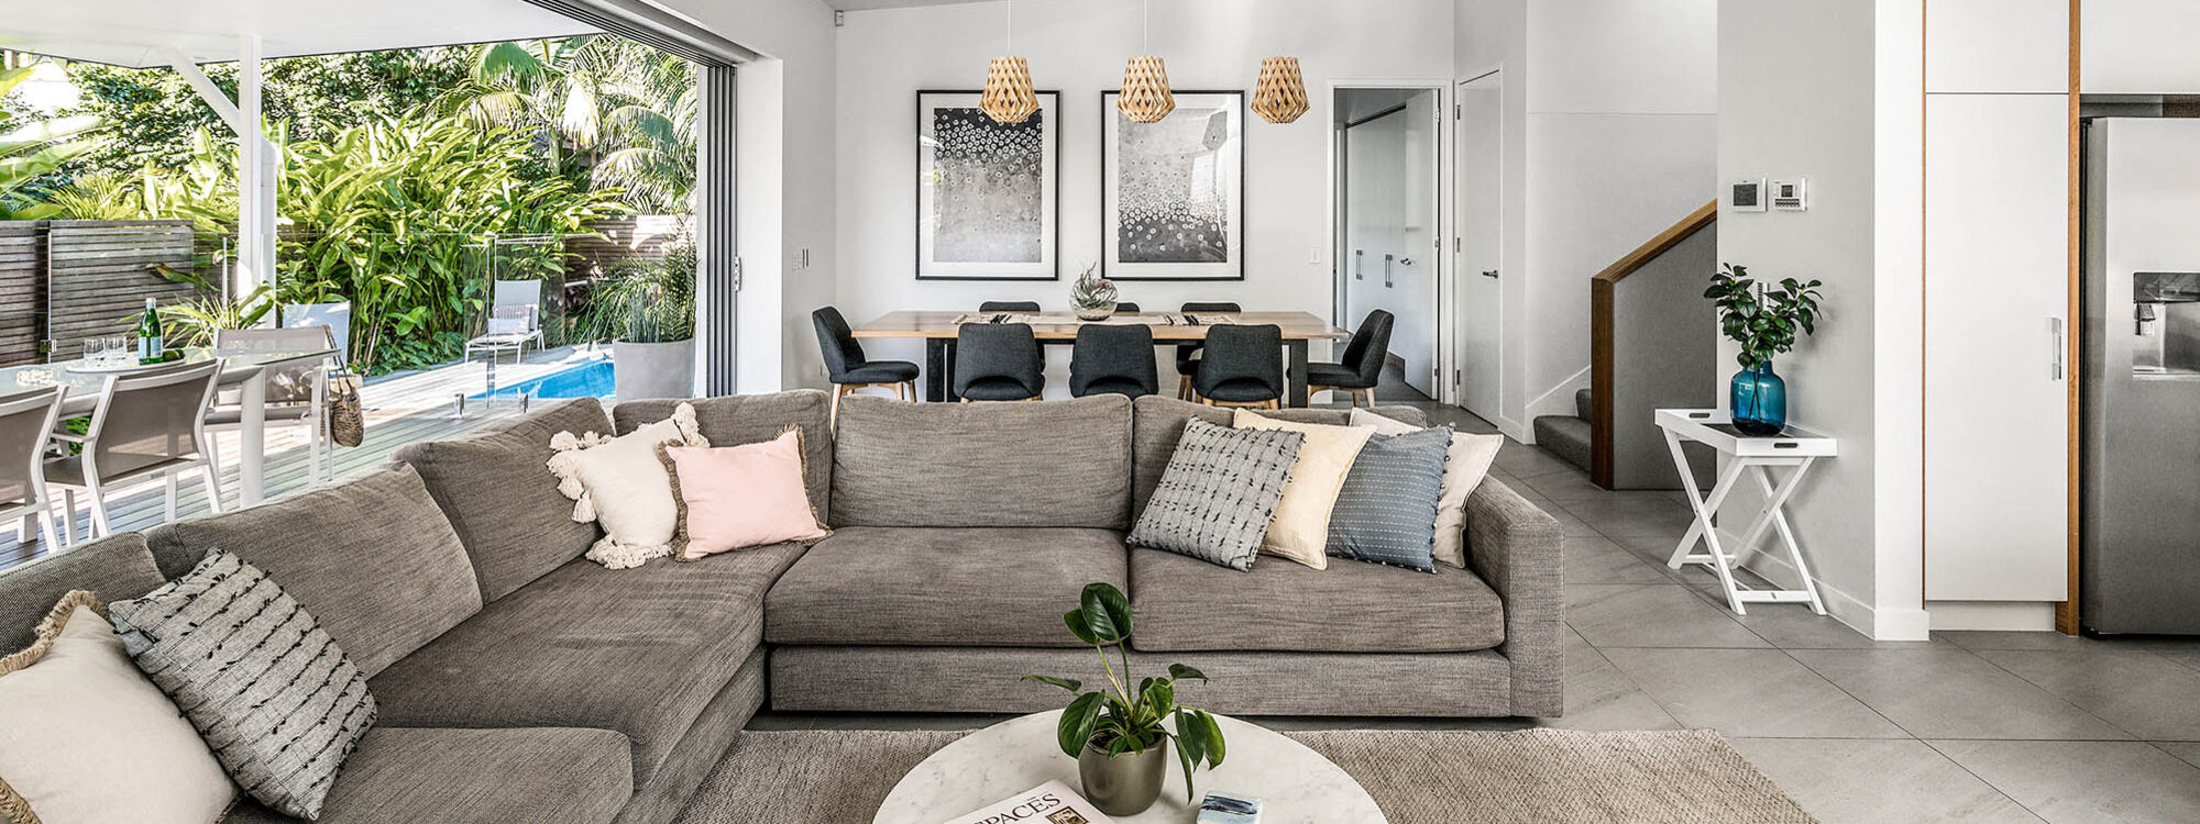 Kaylani Cove - Byron Bay - Lounge and Dining